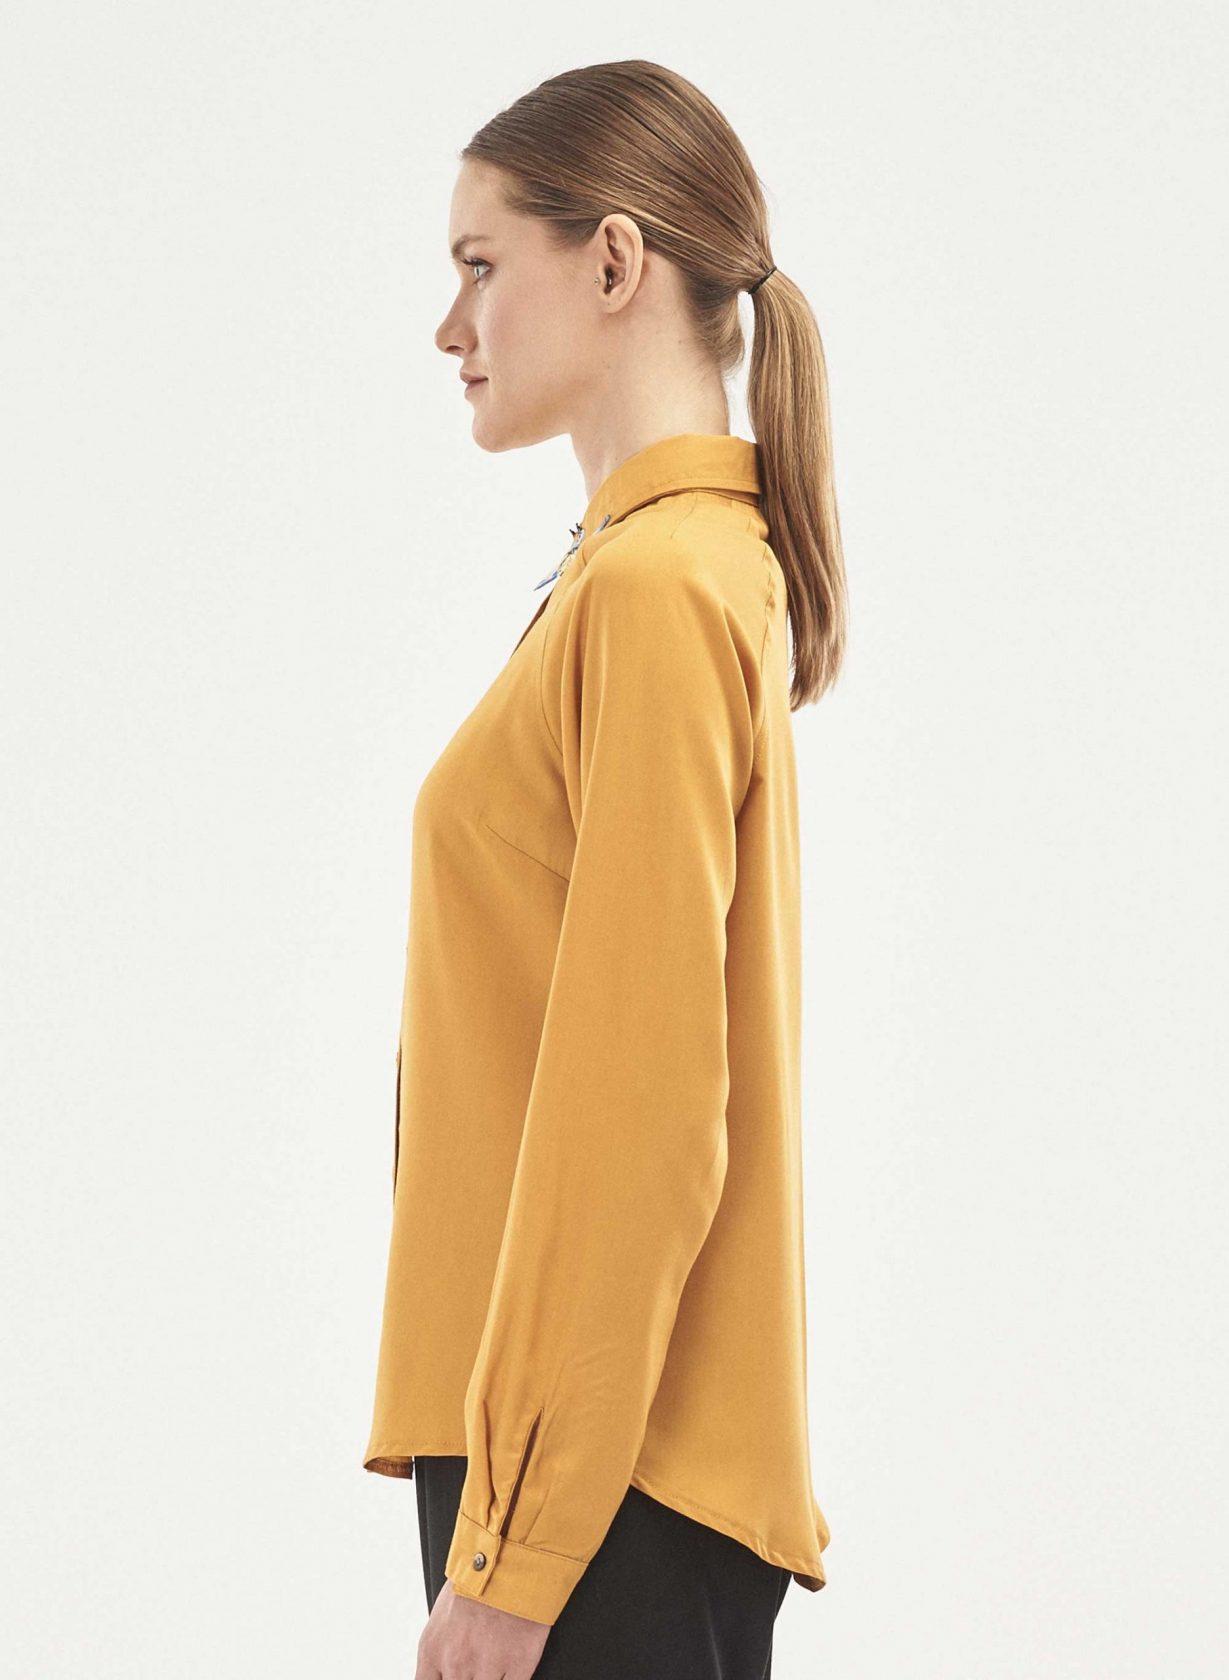 roberta organic fashion Organication Bluse Raglanärmel Kolibri Stickerei senfgelb 3 scaled